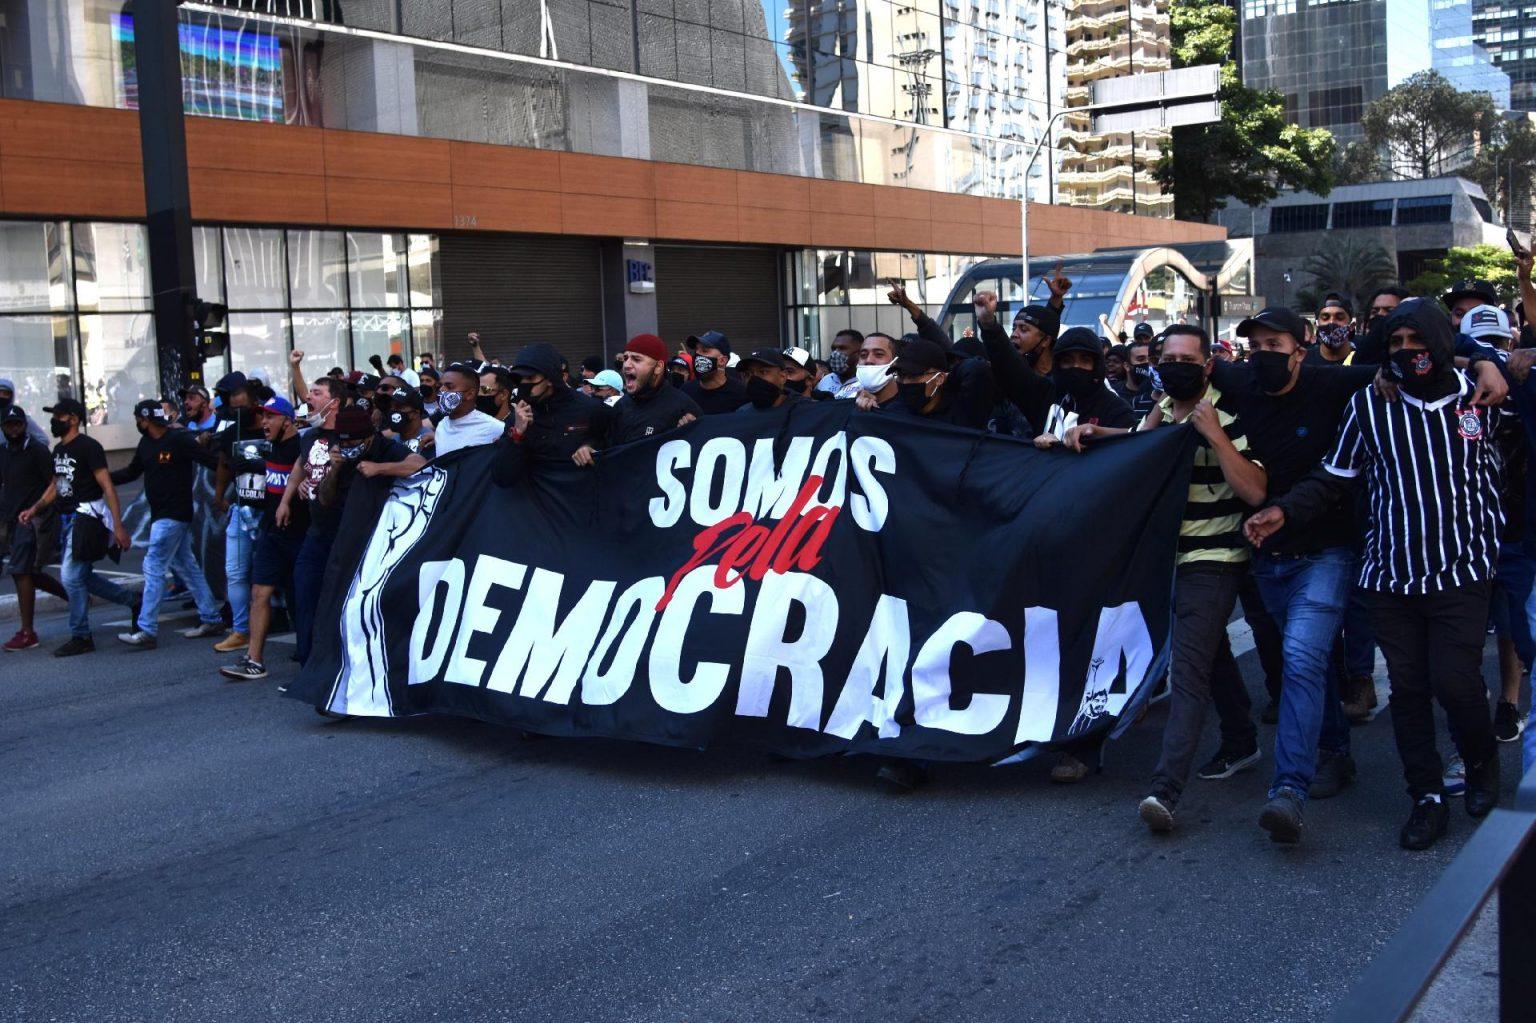 Foto: Jornal de Brasília